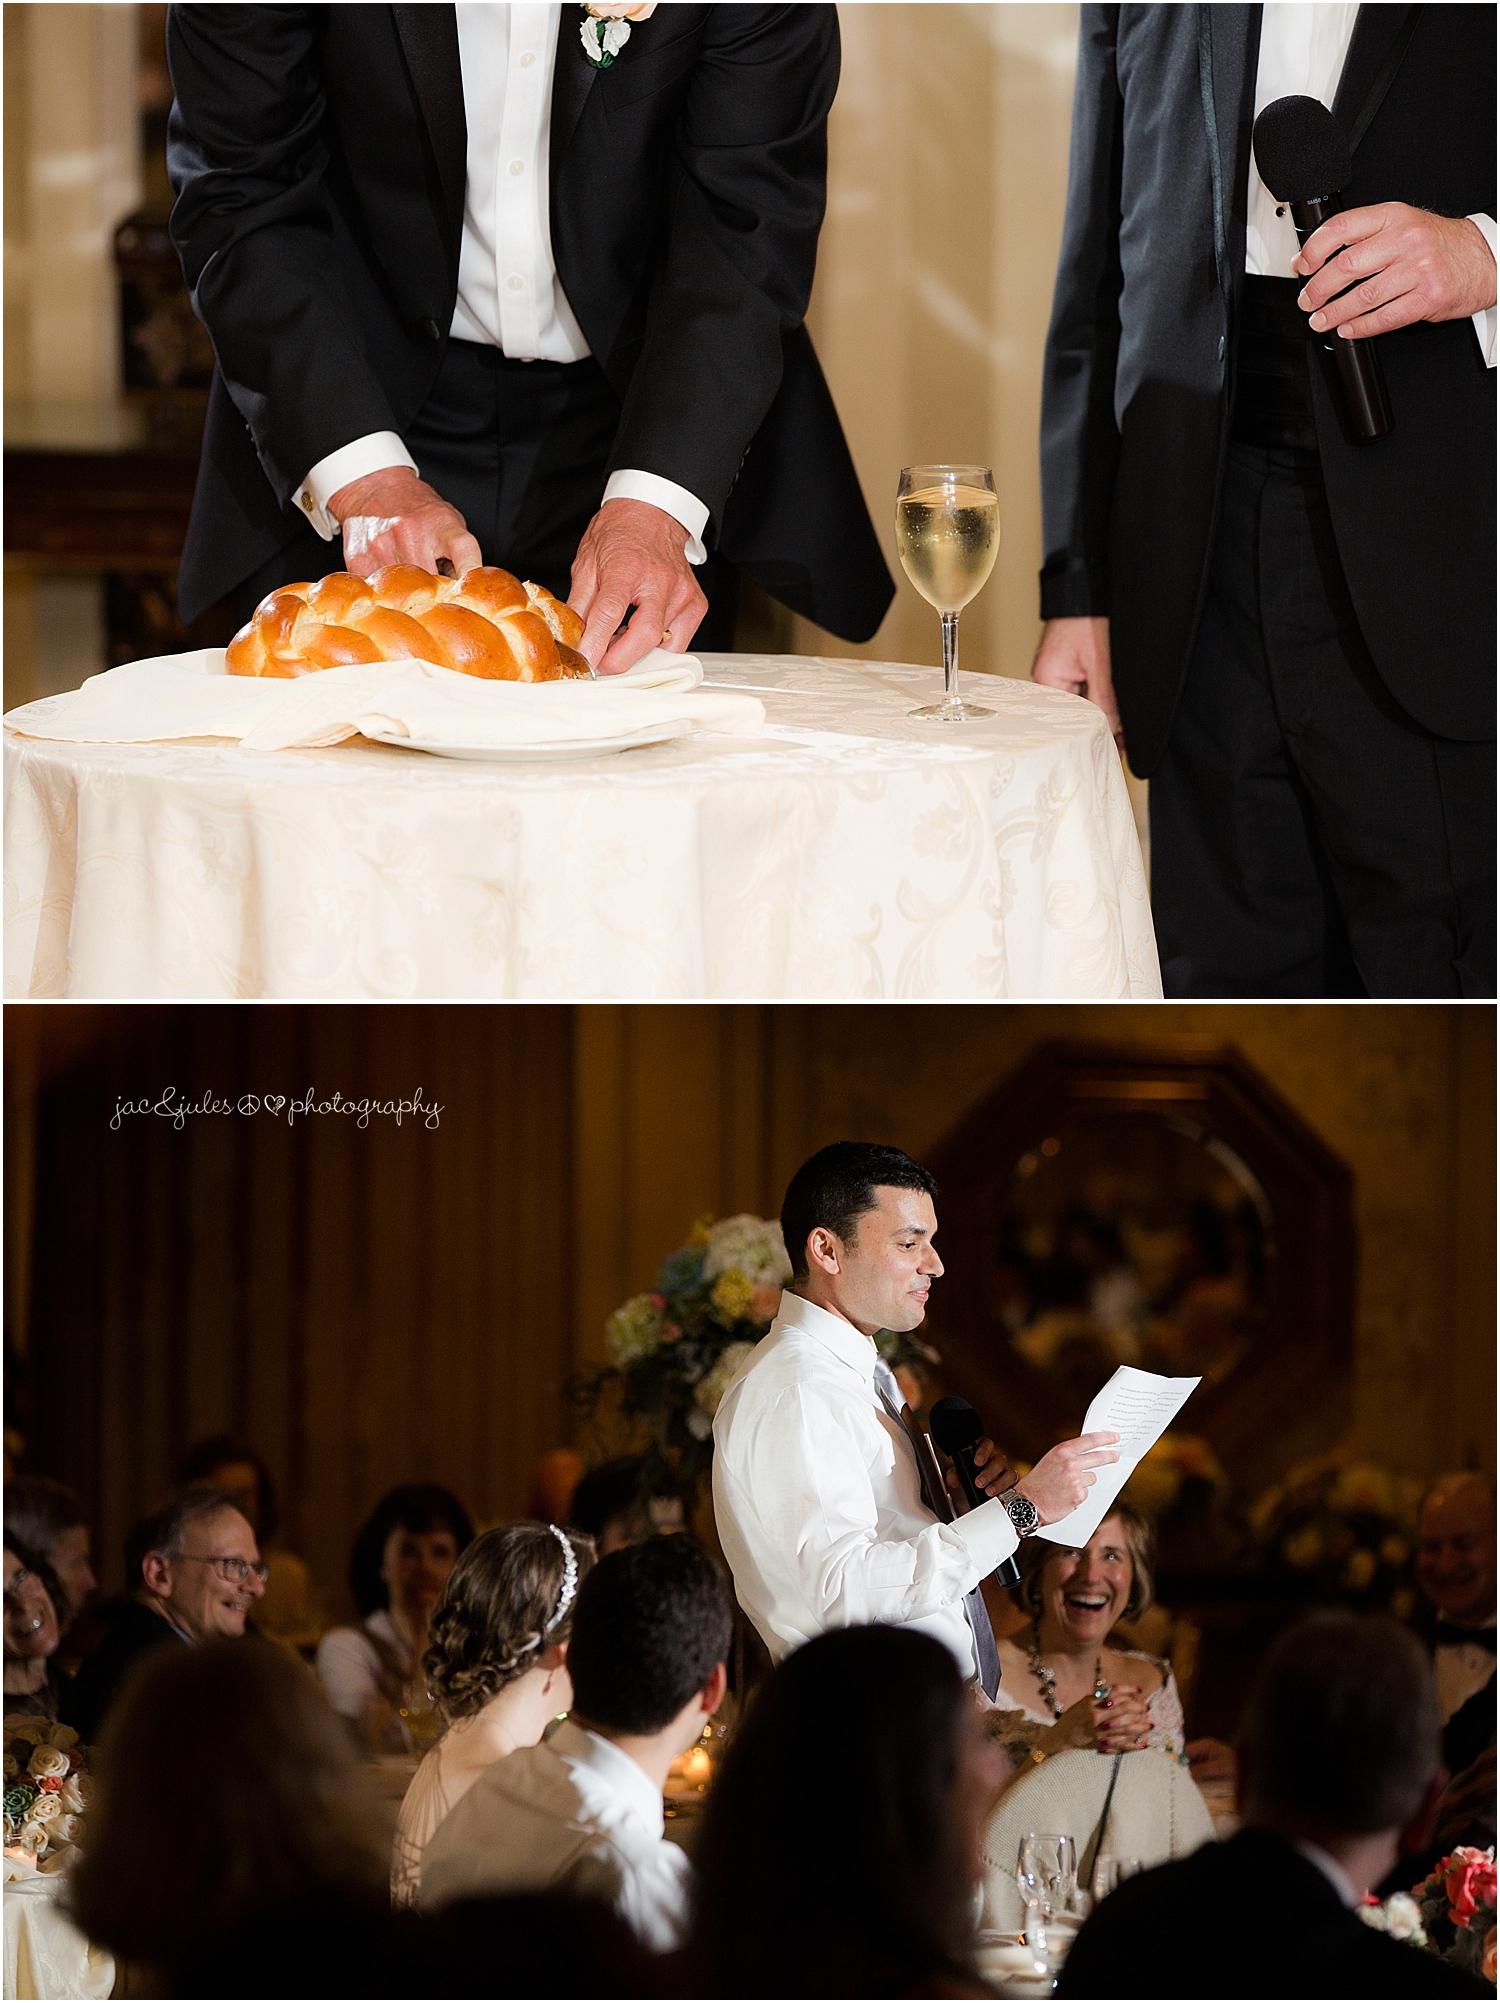 jacnjules photograph wedding reception at the olde mill inn in basking ridge nj